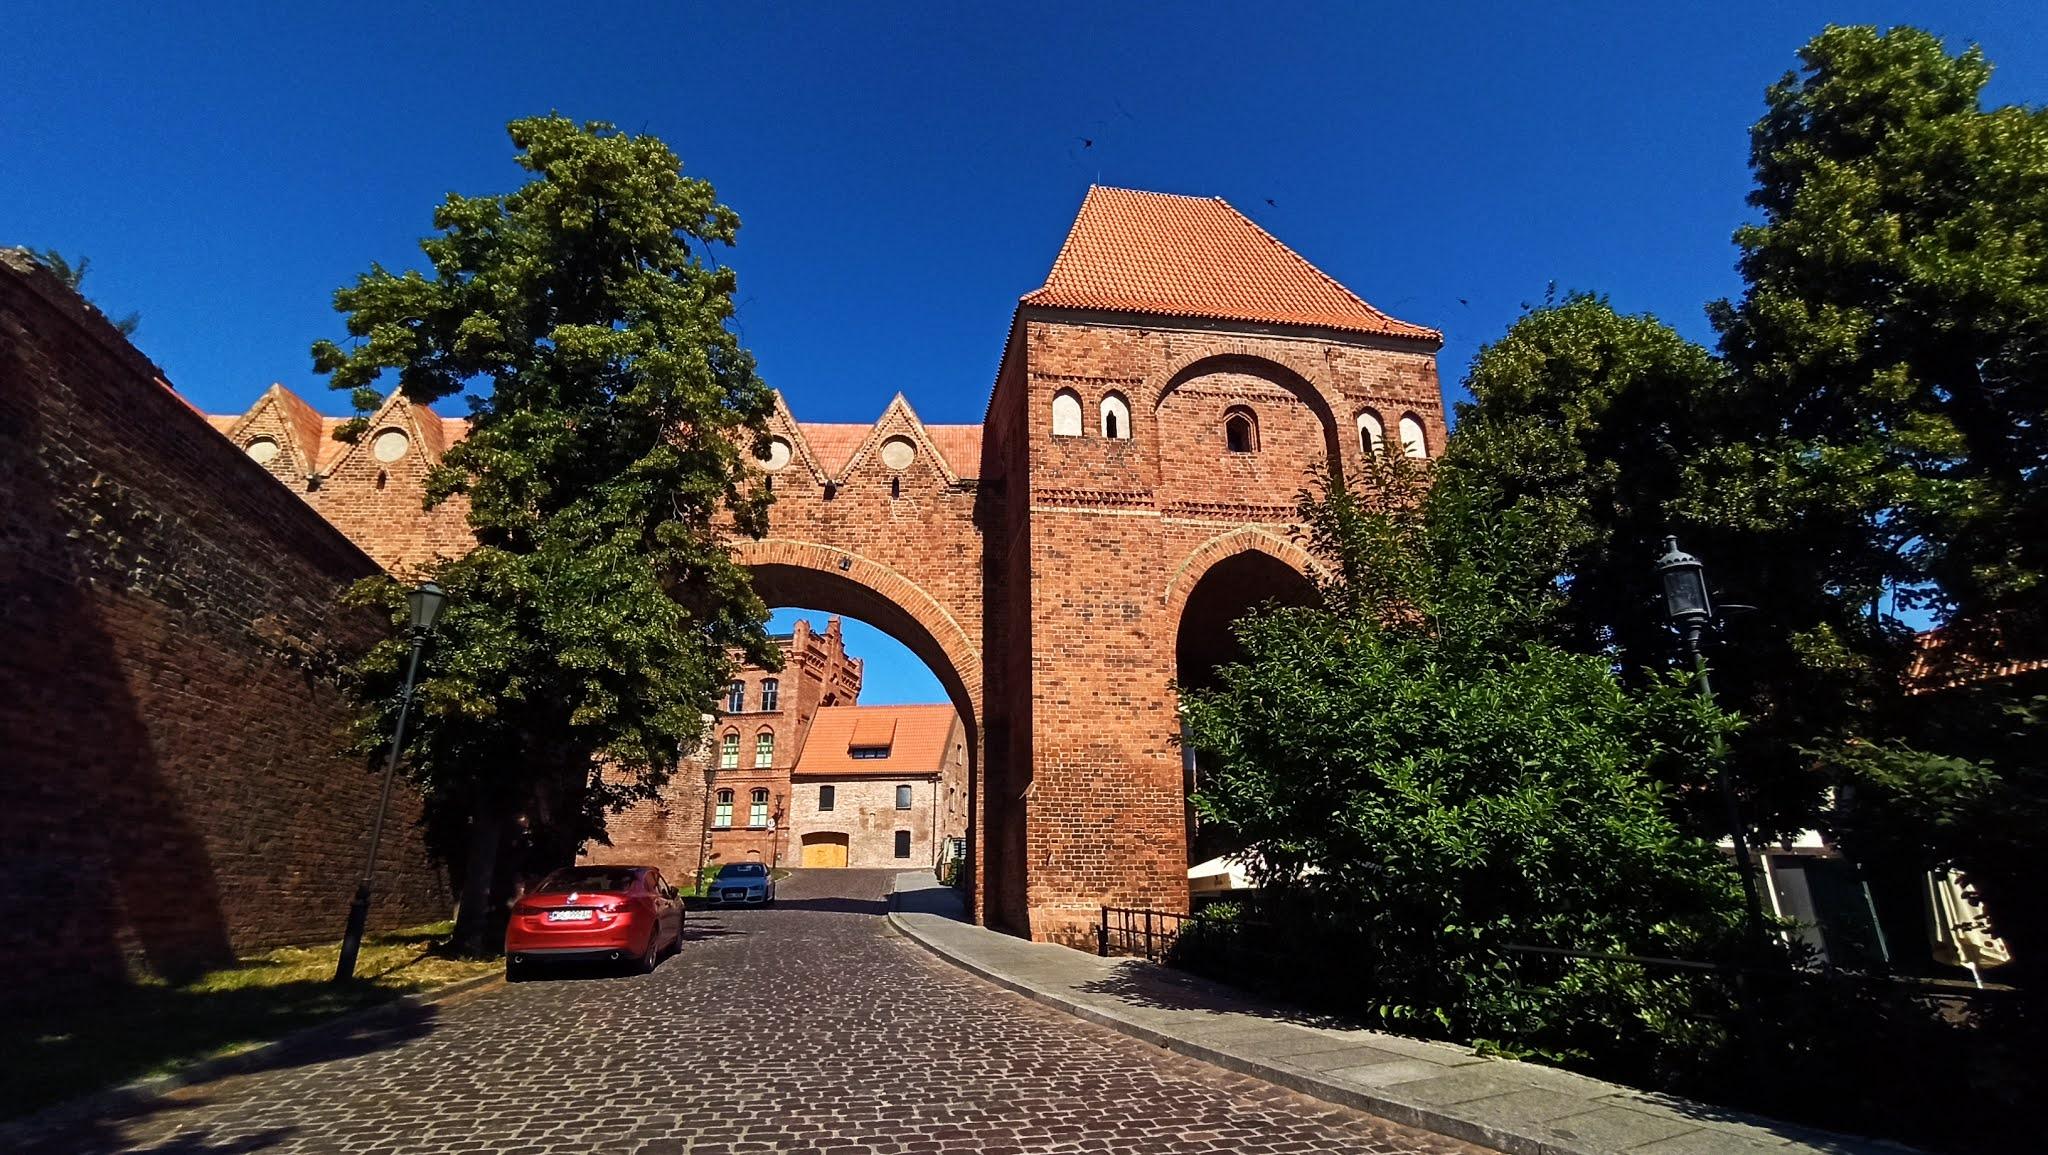 Ruiny zamku w Toruniu